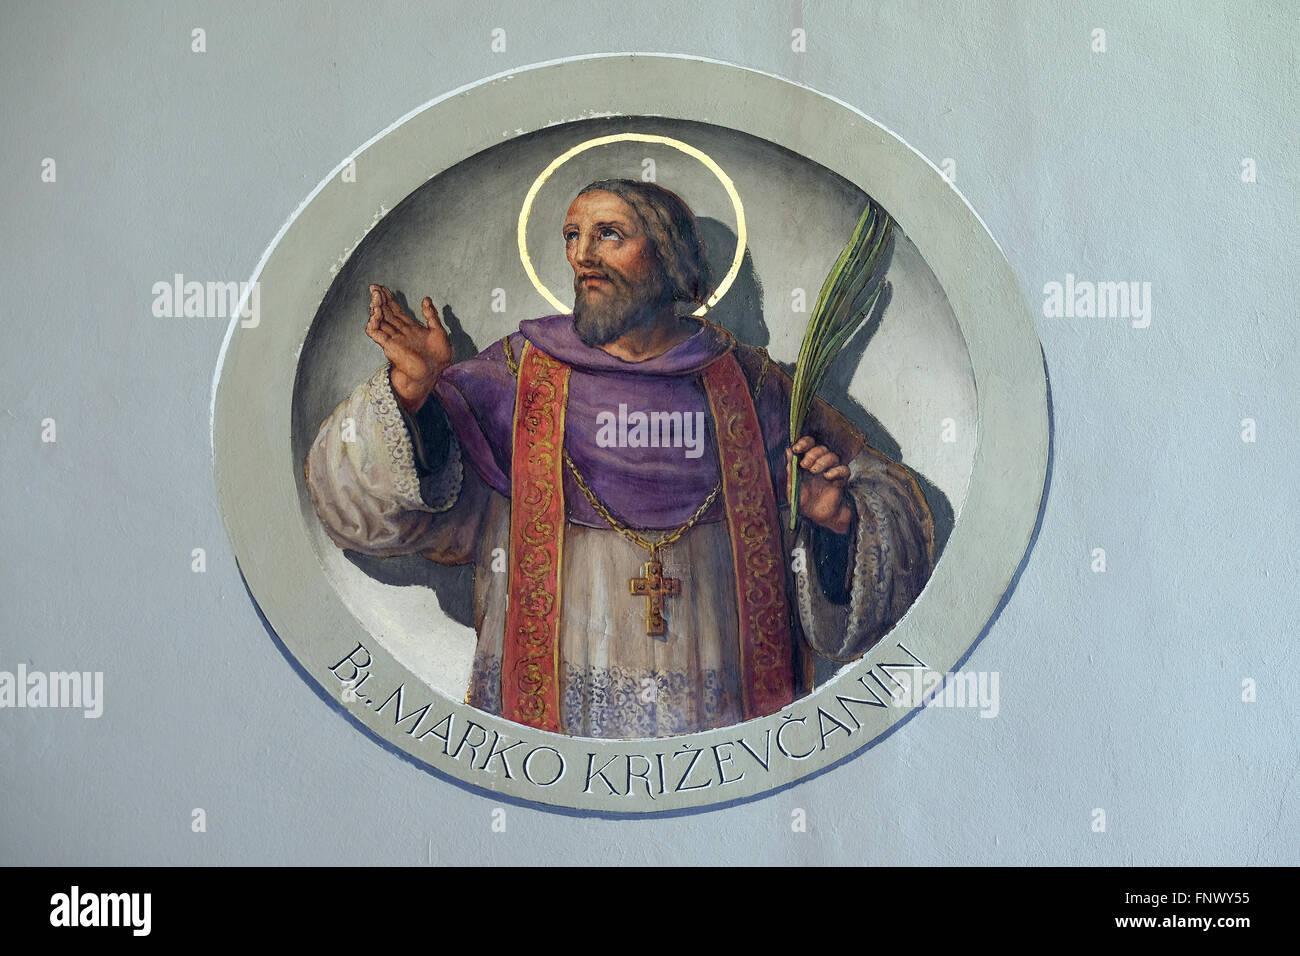 Saint Marko Krizin, fresco in the Basilica of the Sacred Heart of Jesus in Zagreb, Croatia - Stock Image